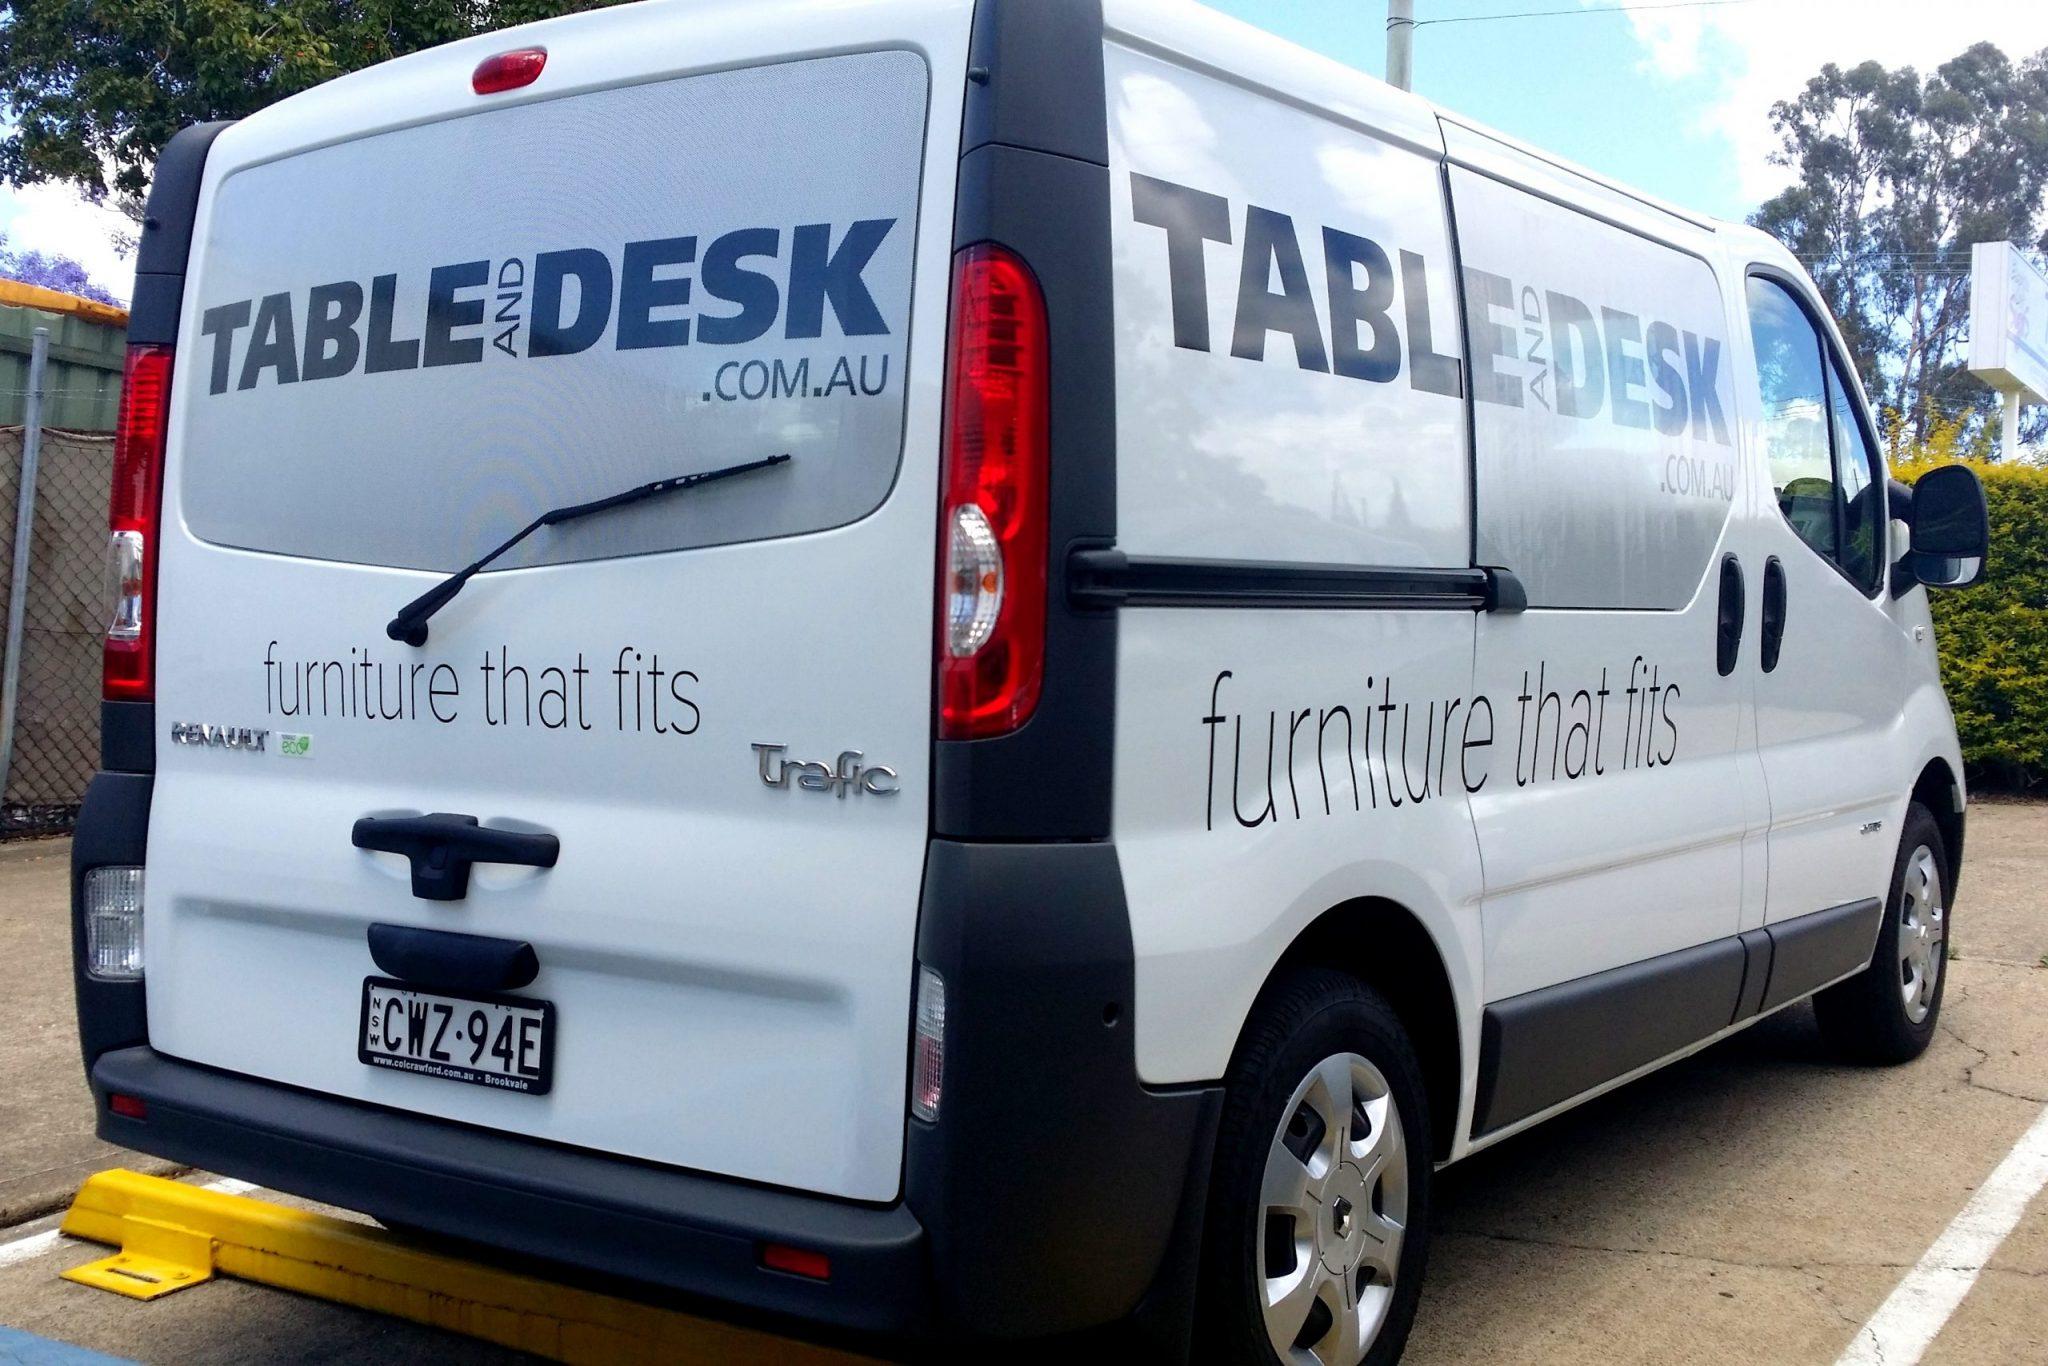 Table&Desk